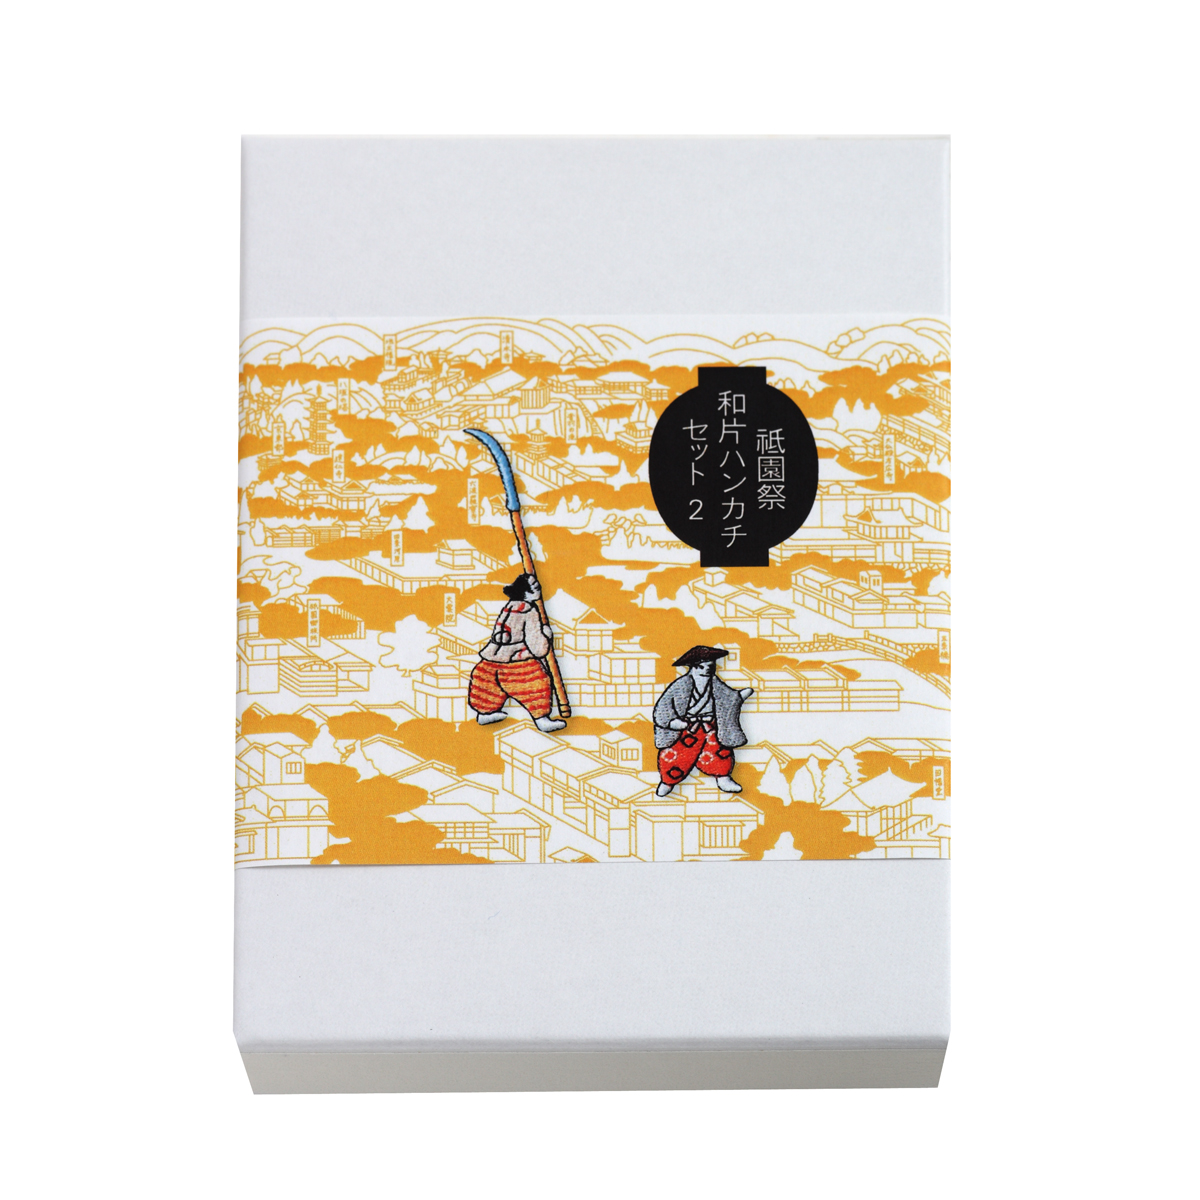 KY58-038/祇園祭ハンカチワッペンセット/蟷螂山